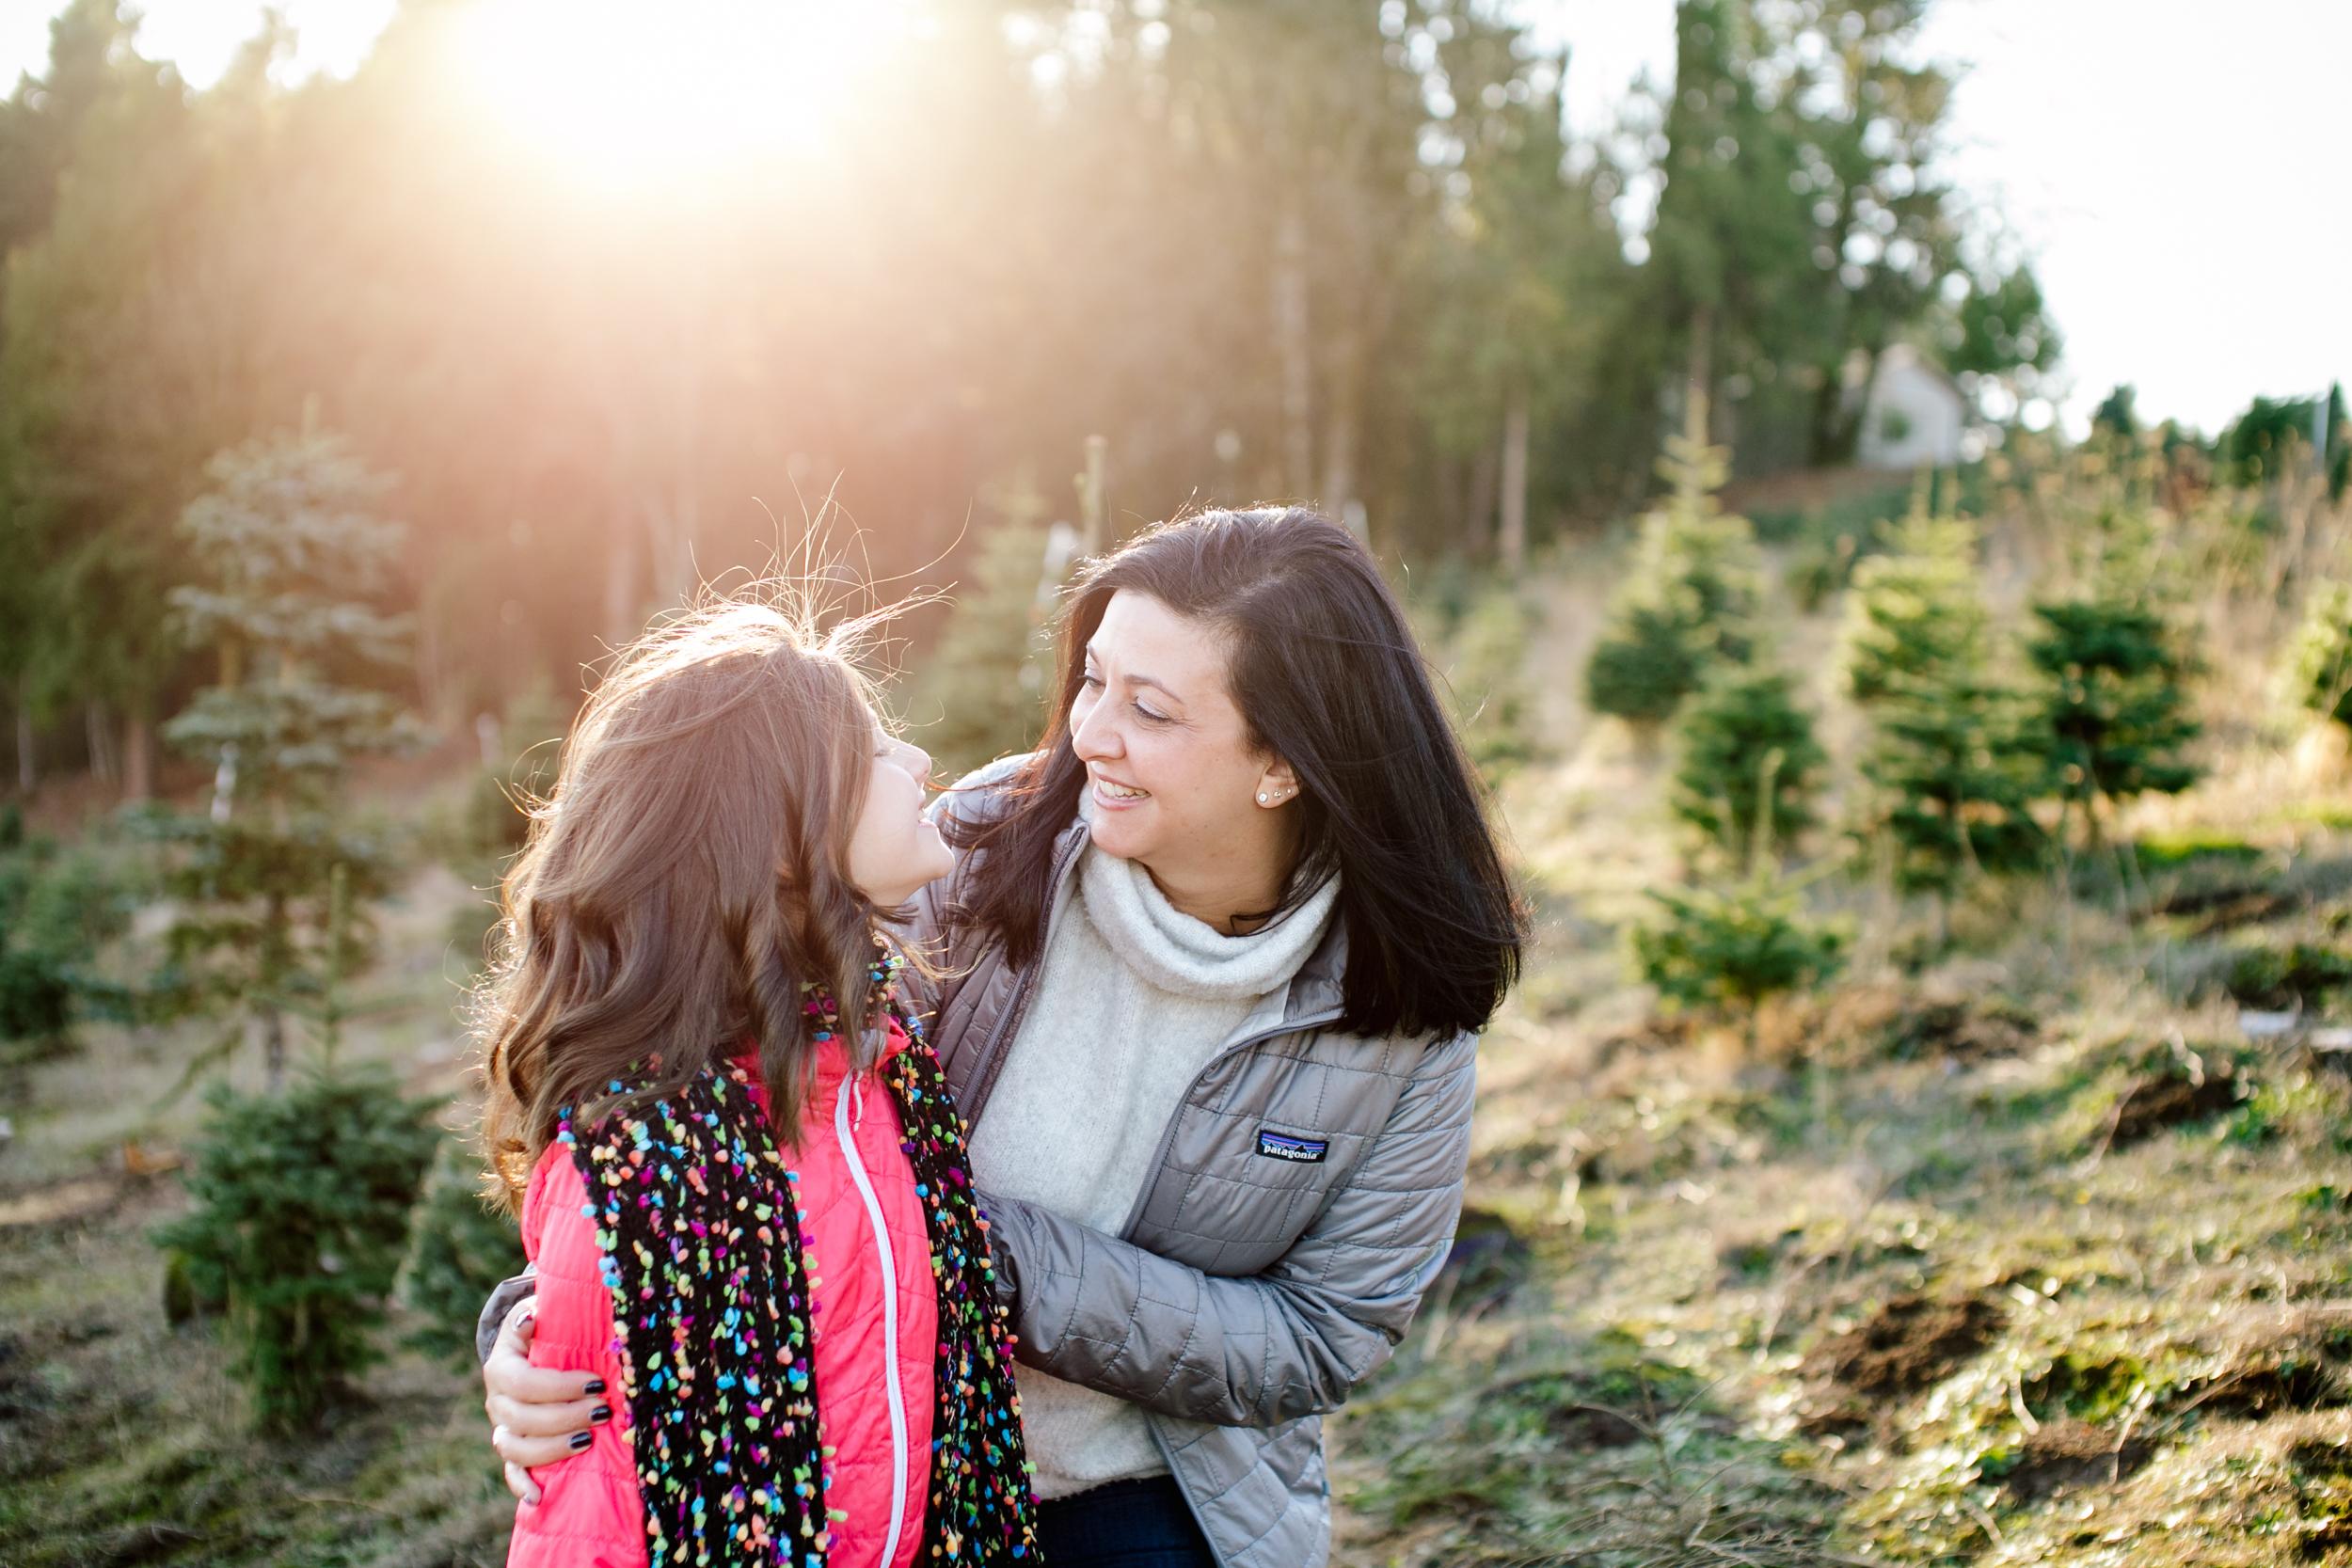 sleighbells-of-sherwood-family-photos-4.jpg